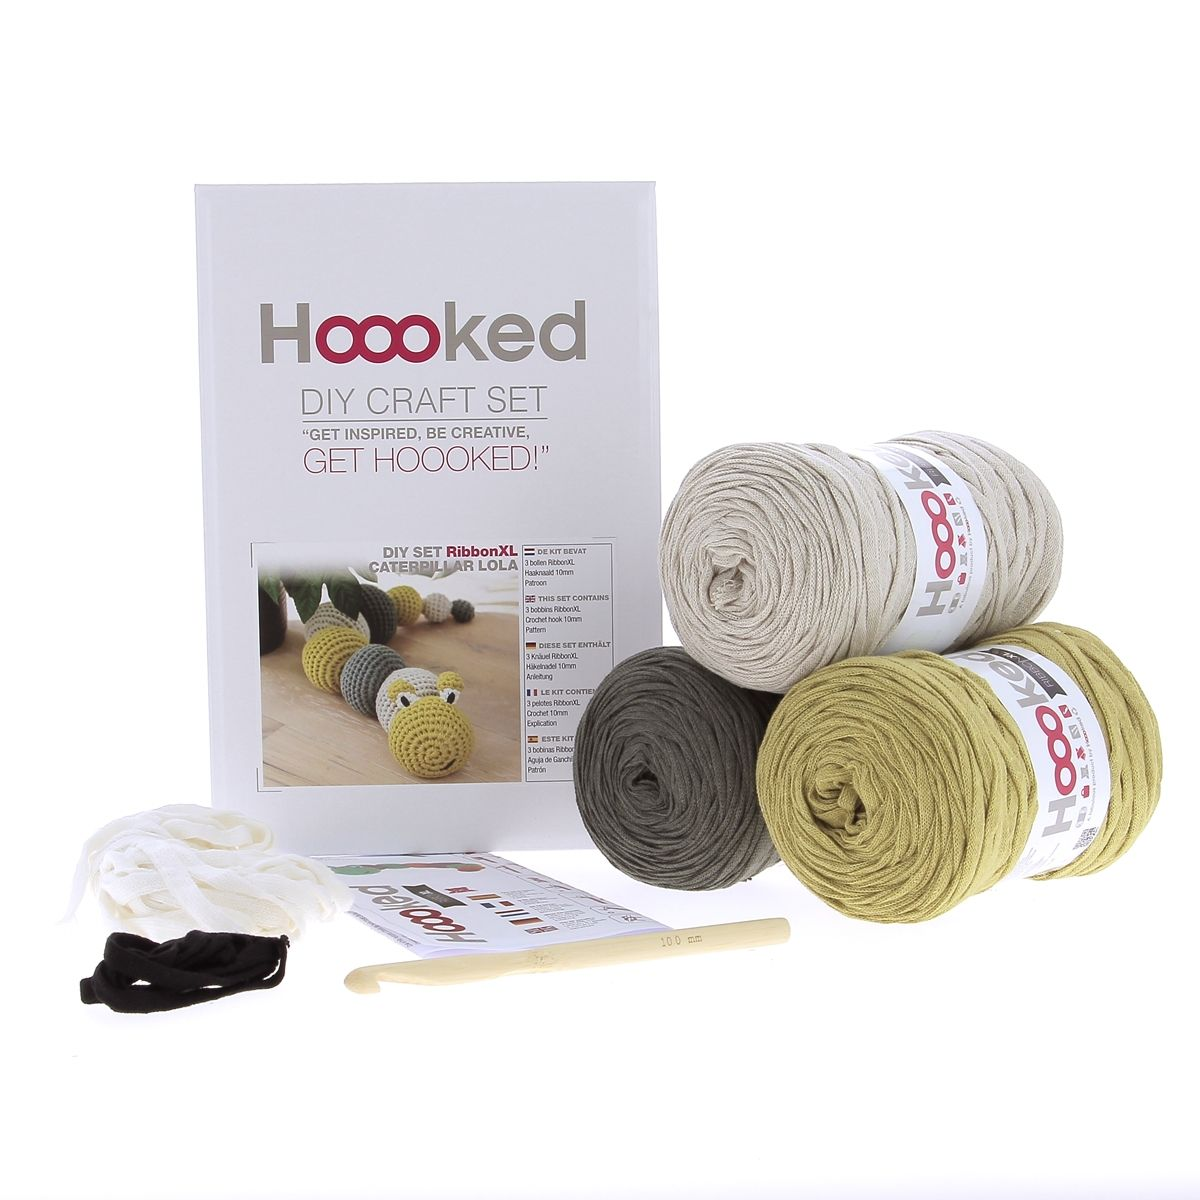 DIY Haakpakket RibbonXL Caterpillar Lola Hoooked 4